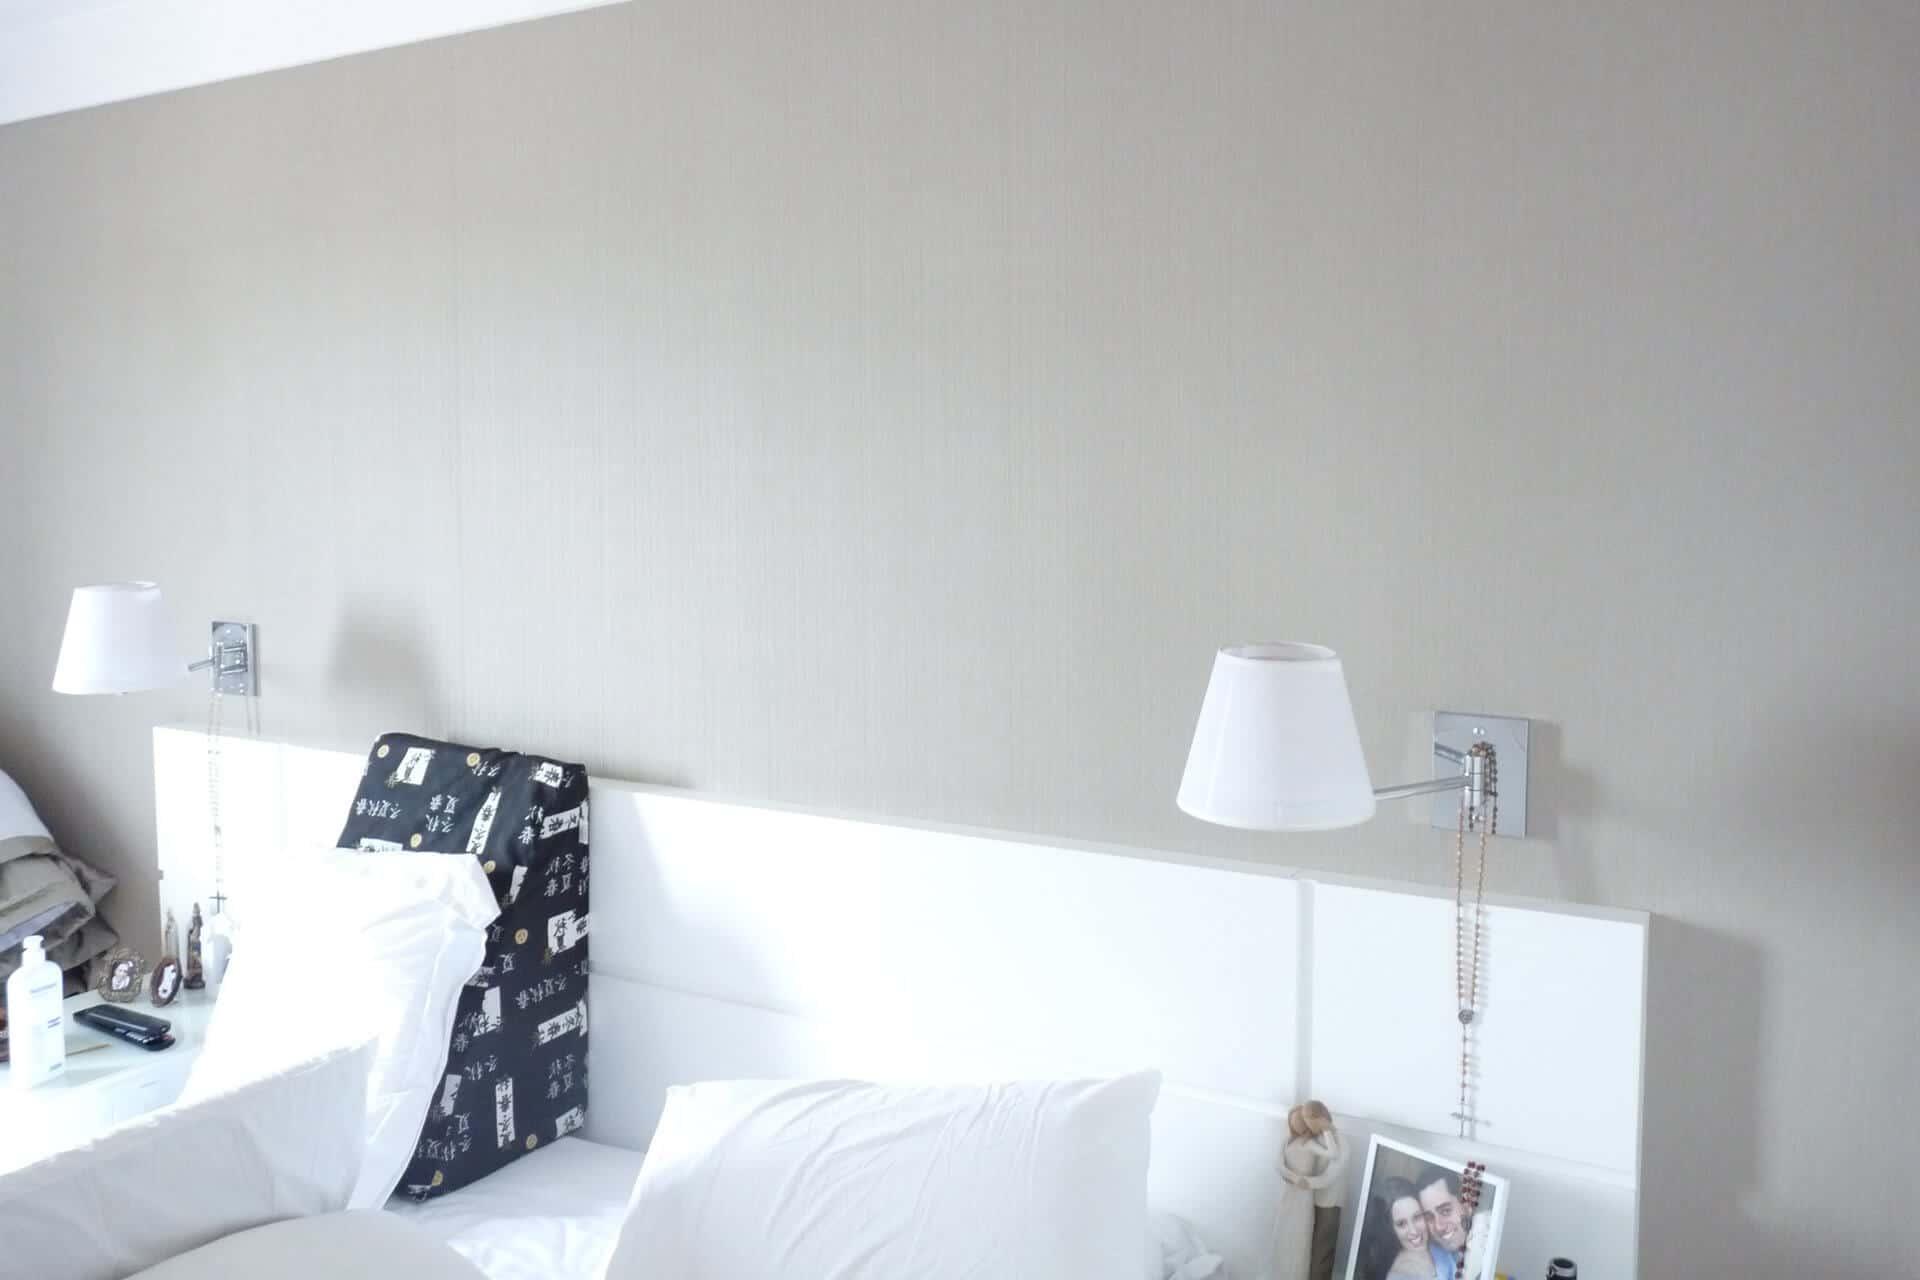 dormitorio-planejado_moveis-sob-medida-galeria-145